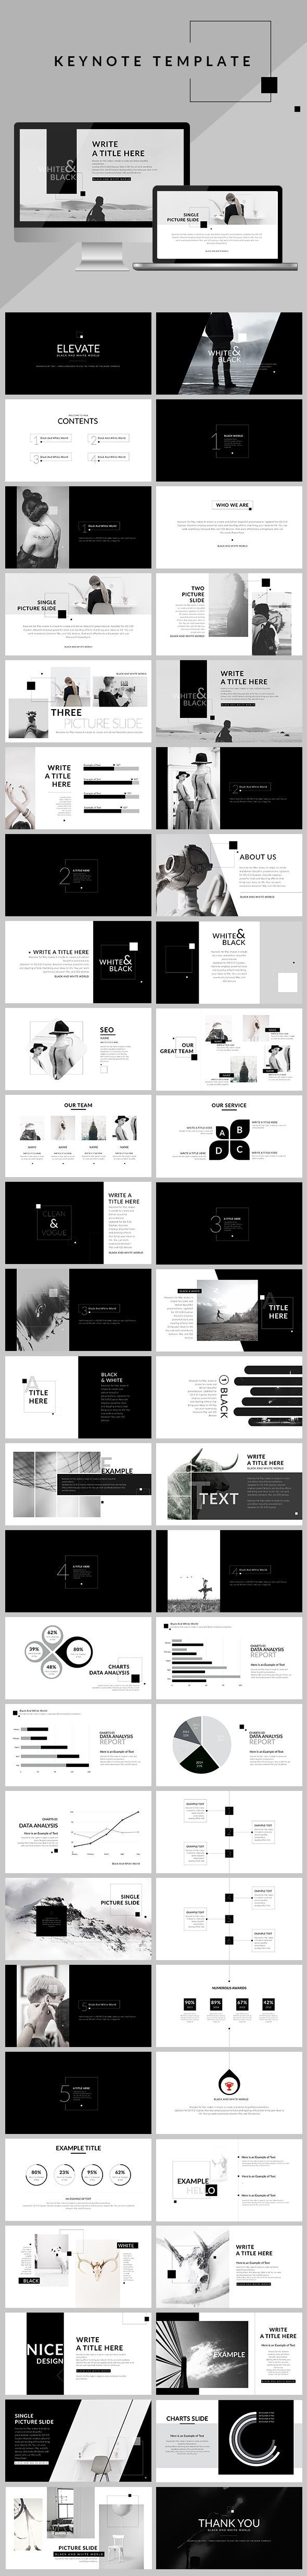 black & white - clean keynote template | minimal, keynote design, Presentation templates